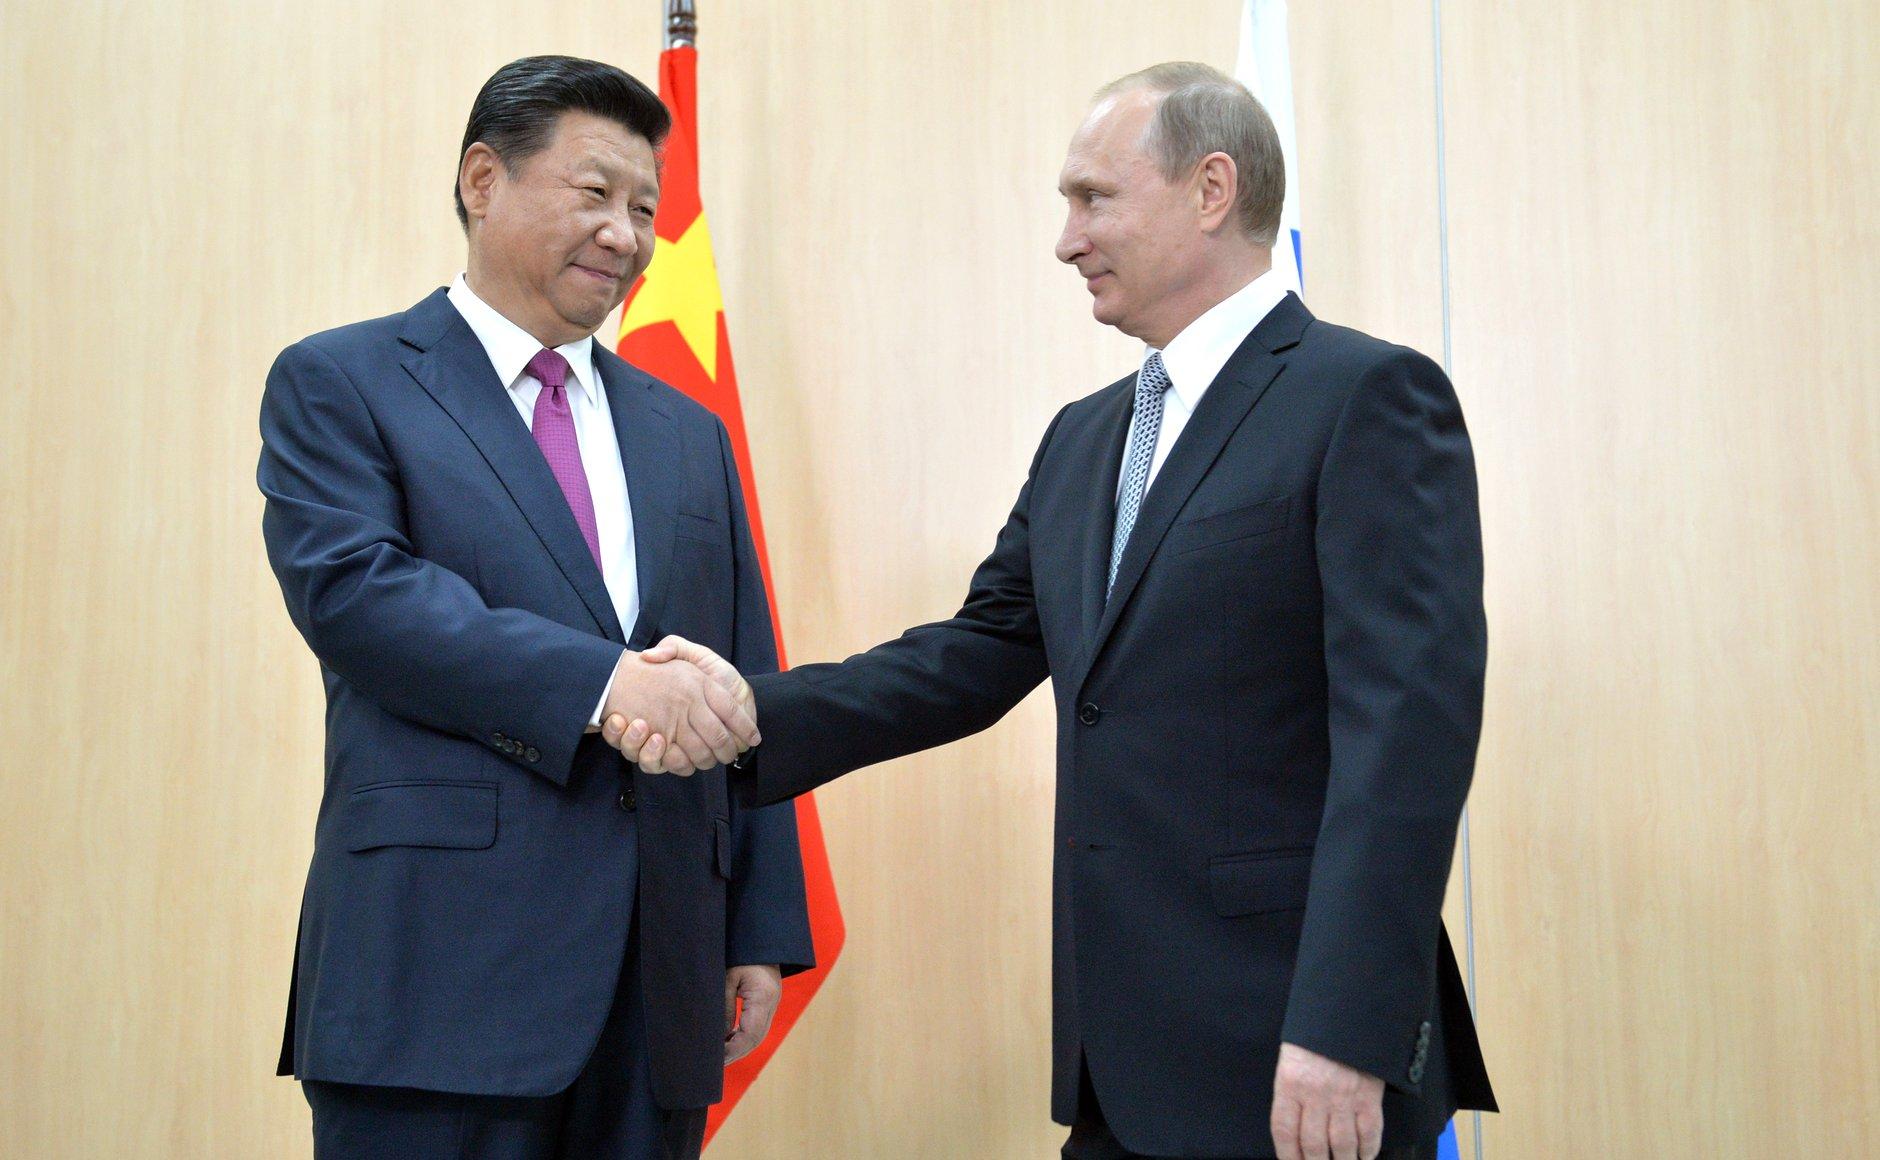 Vladimir Putin and Xi Jinping, BRICS summit 2015.Image Source: Wikimedia Commons/ Пресс-служба Президента России